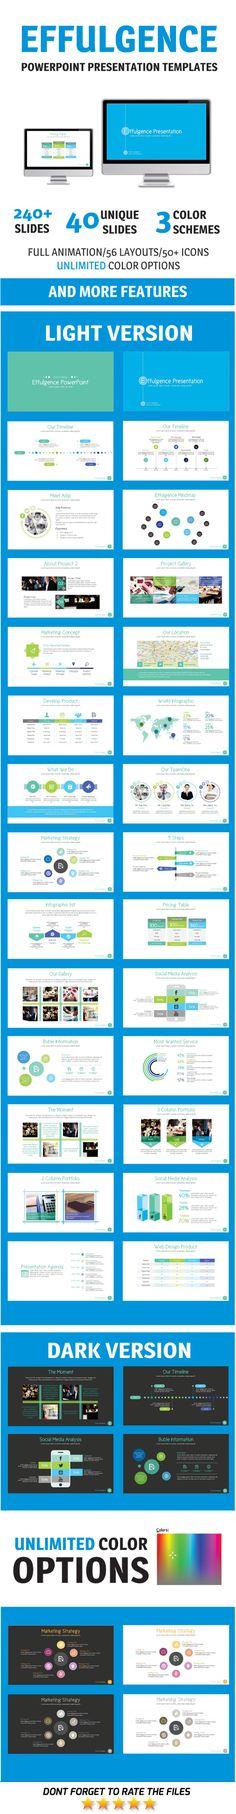 Effulgence PowerPoint Template #slides #presentation Download: http://graphicriver.net/item/effulgence-powerpoint-template/11120046?ref=ksioks